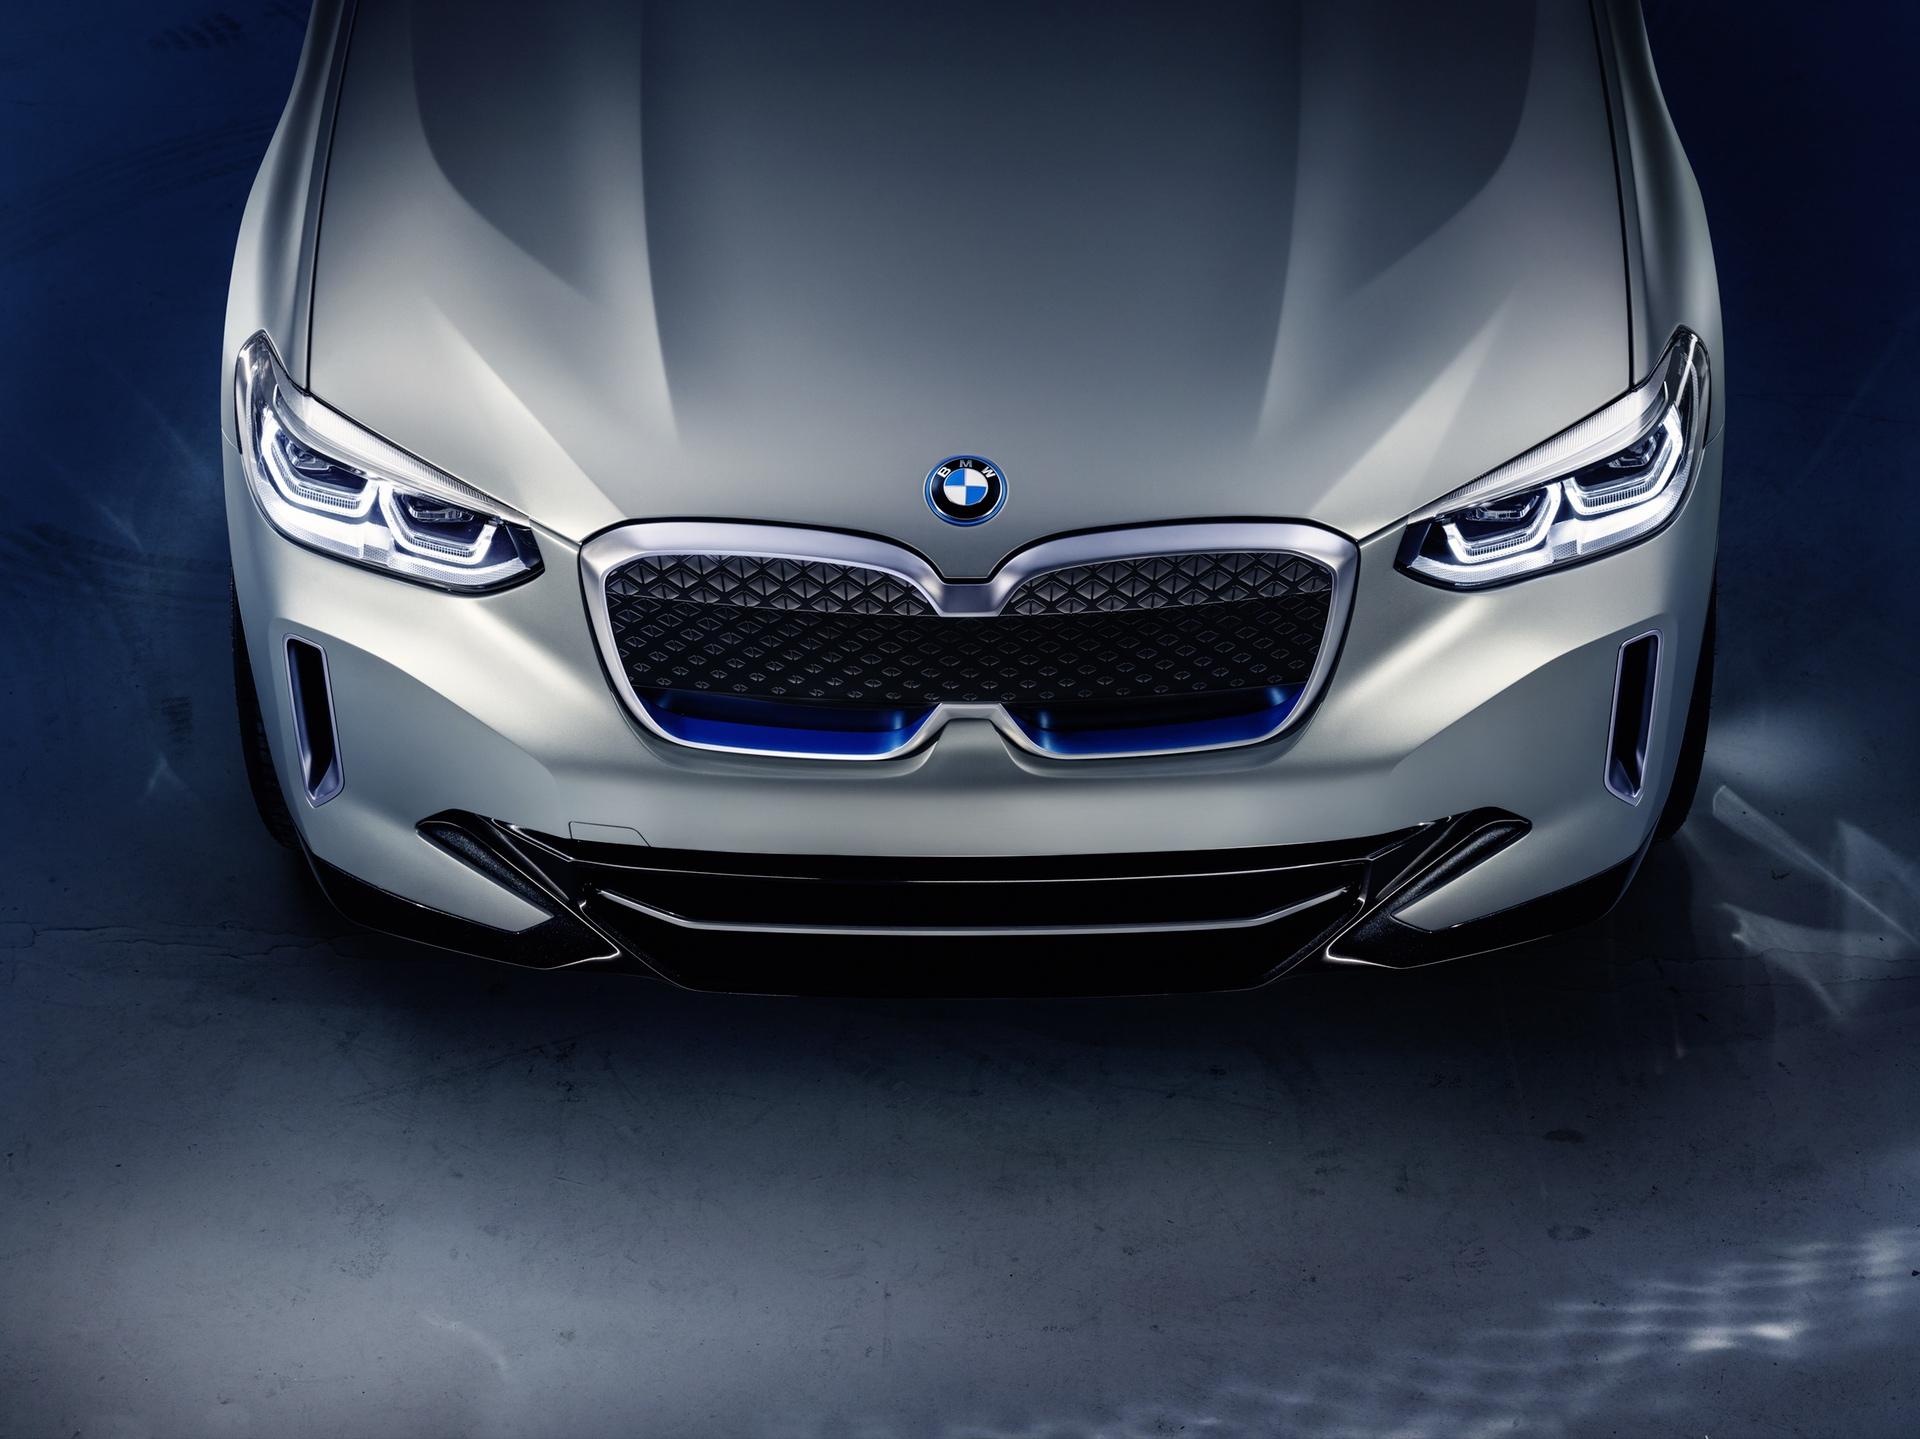 BMW_iX3_Concept_0012